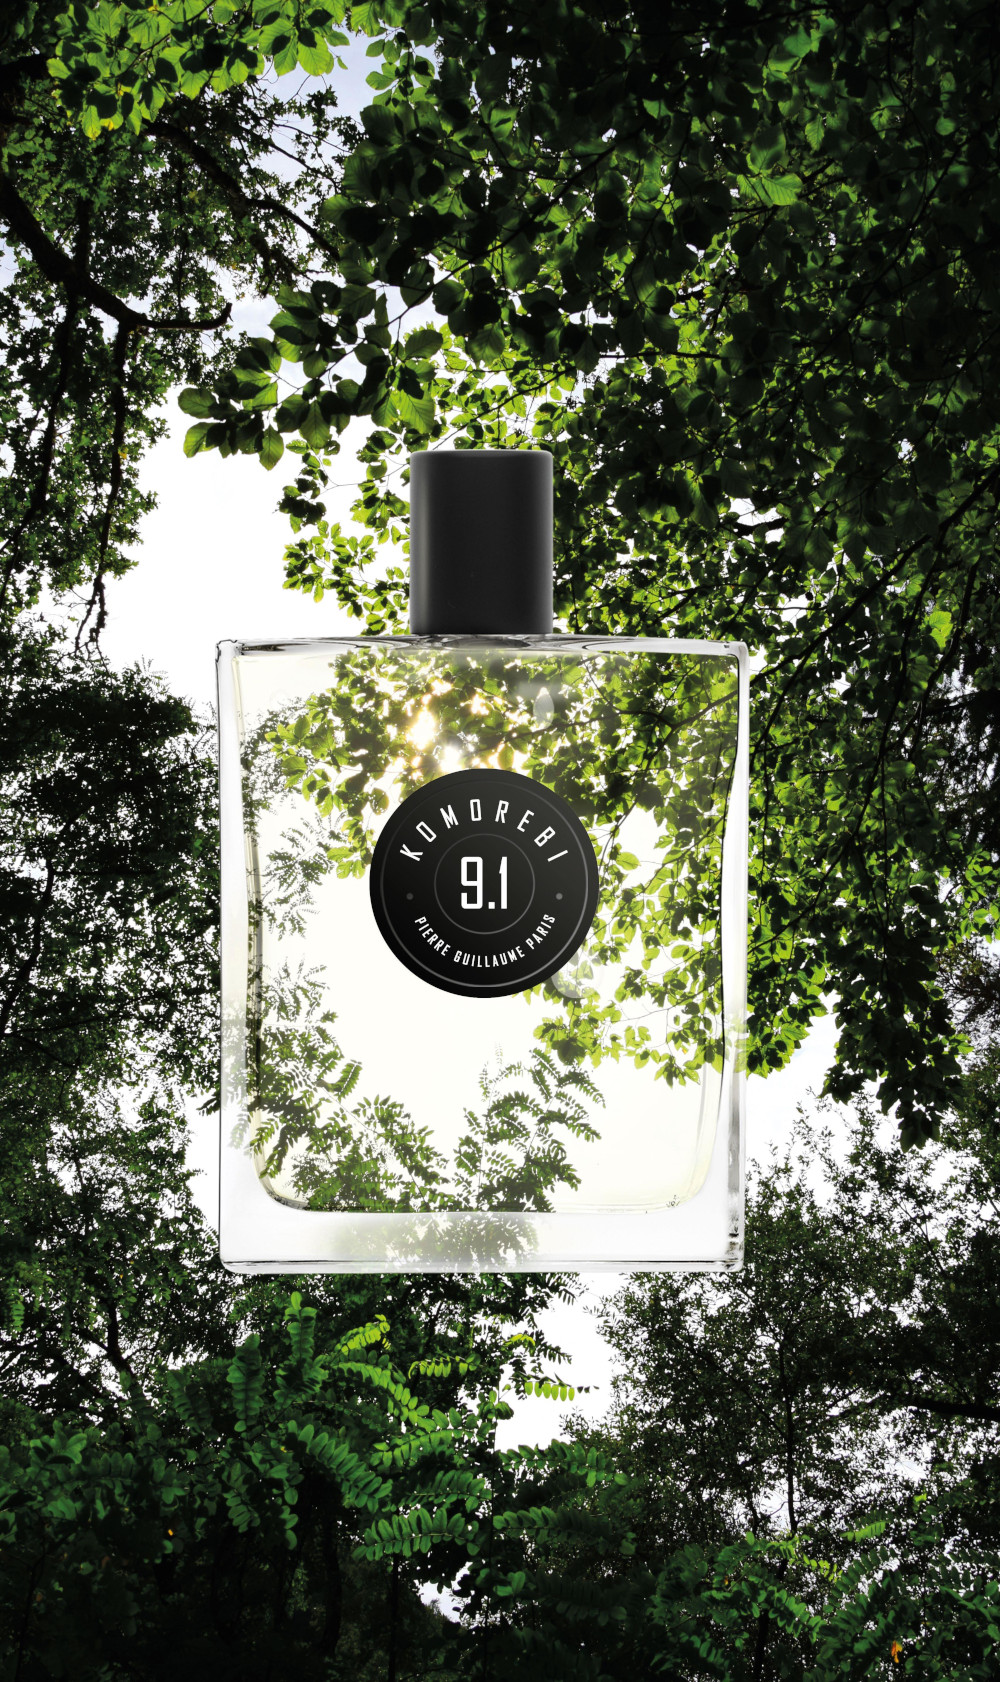 Parfumerie Générale - Komorebi No.9.1